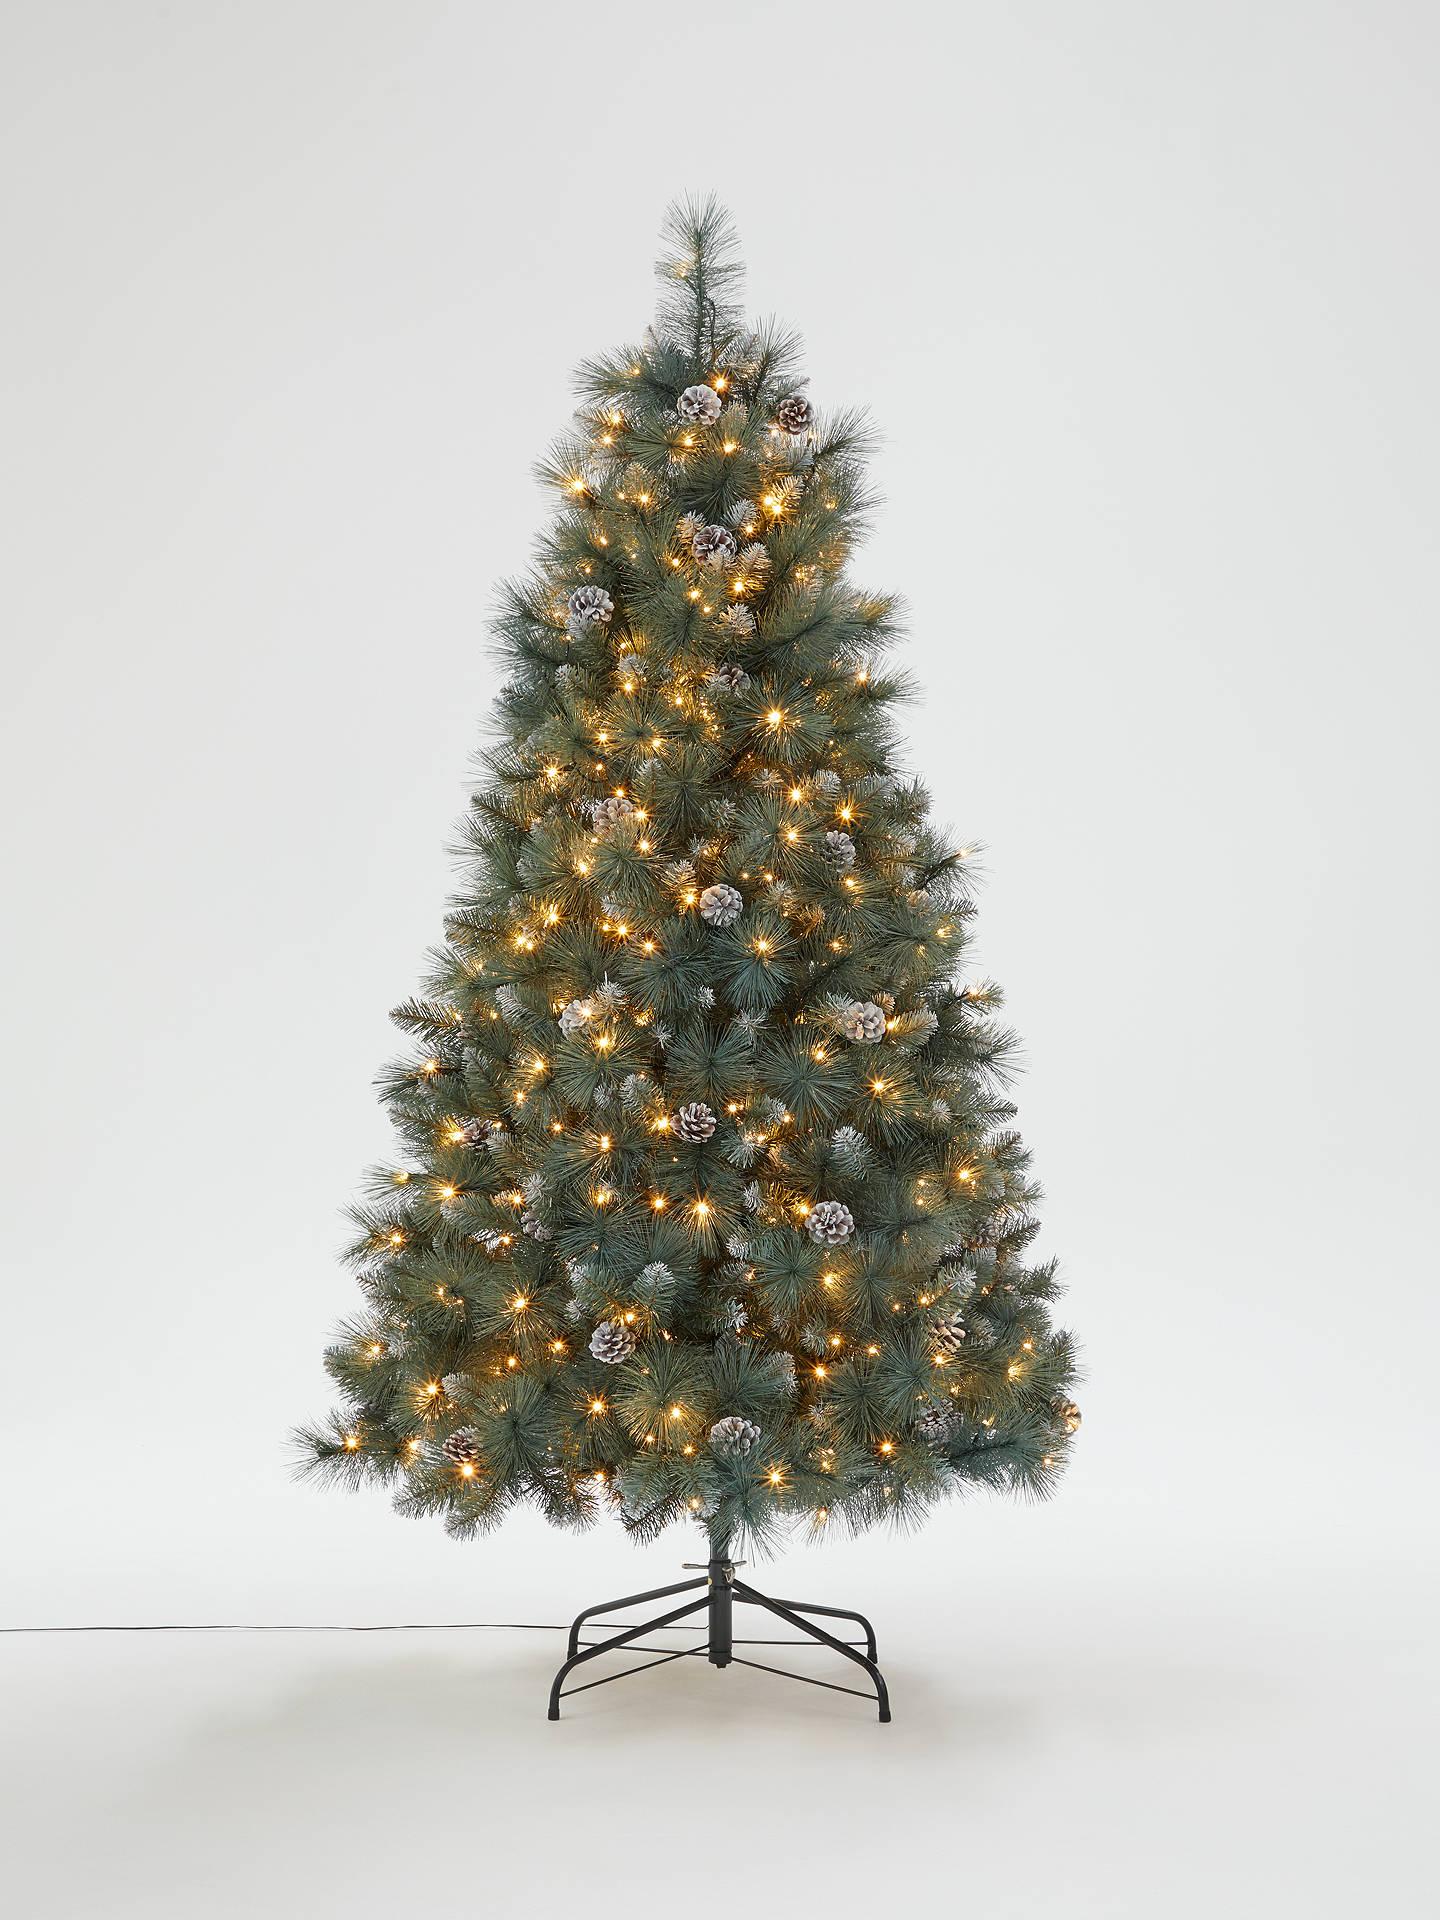 John Lewis & Partners Smokey Pine Pre-lit Christmas Tree, 6ft at John Lewis & Partners